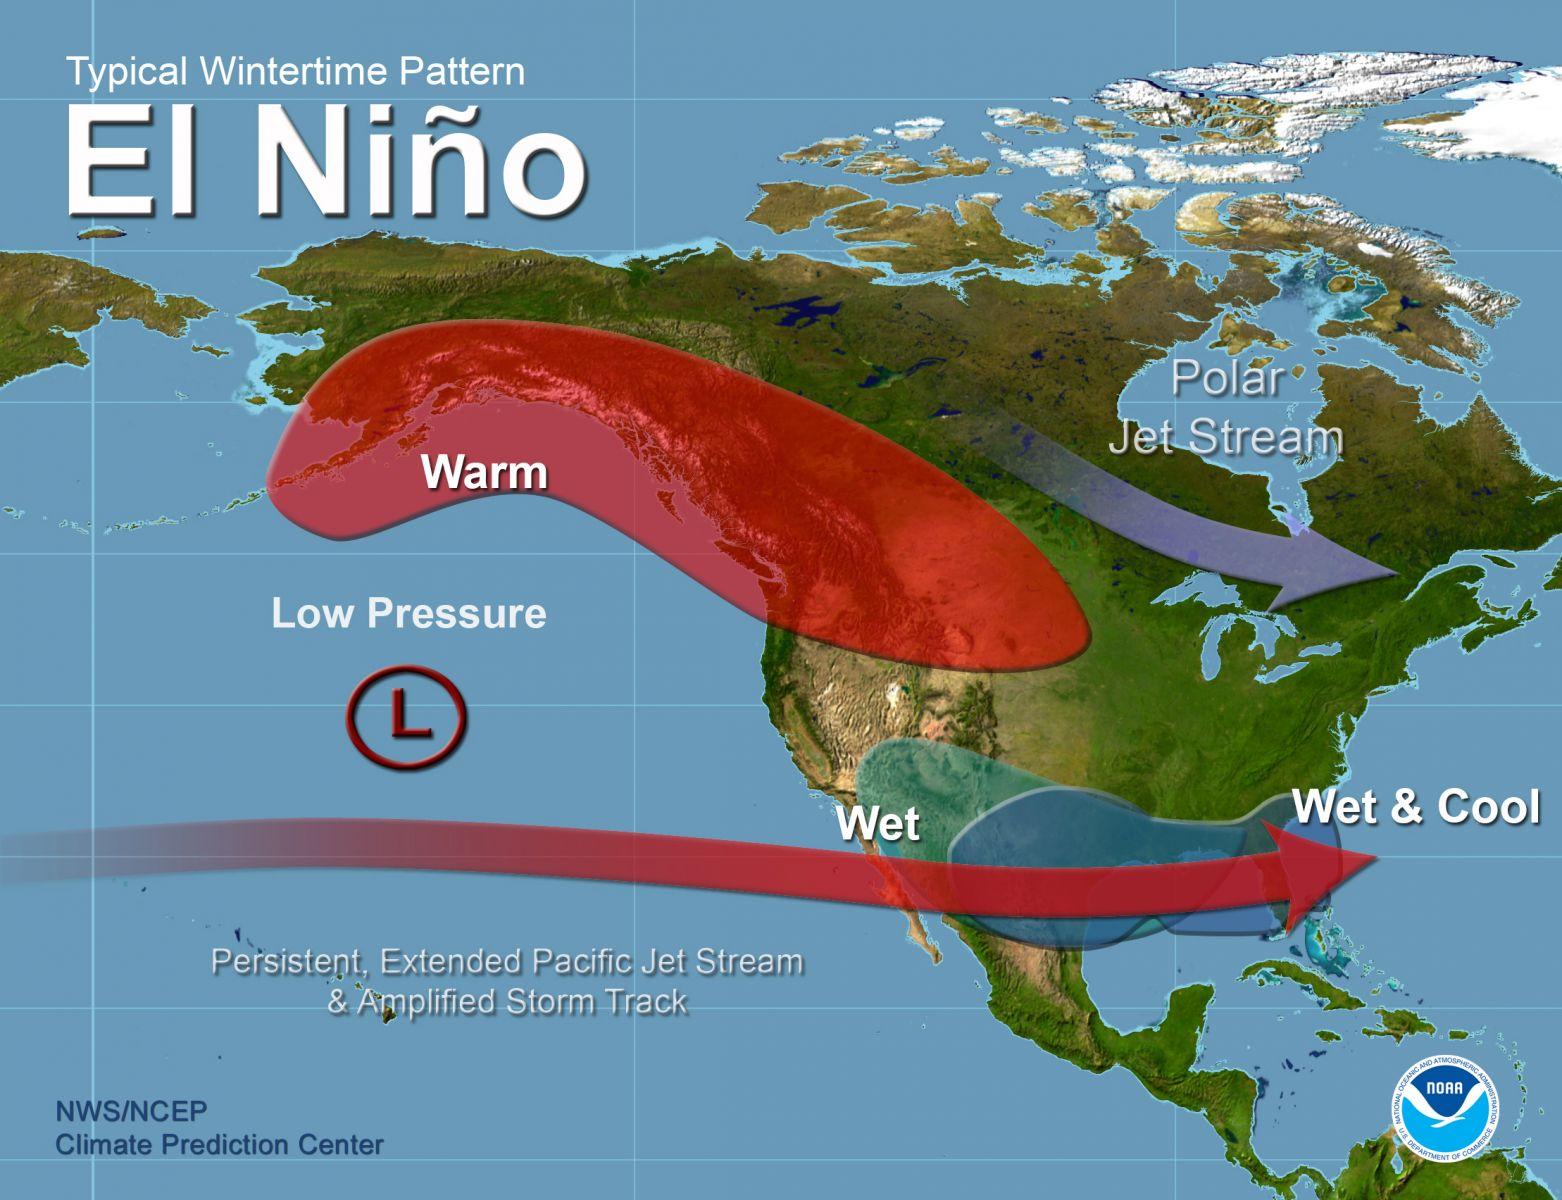 FileNNVL US Jet Stream Png Wikimedia Commons Mangled Jet - Us weather map with jet stream